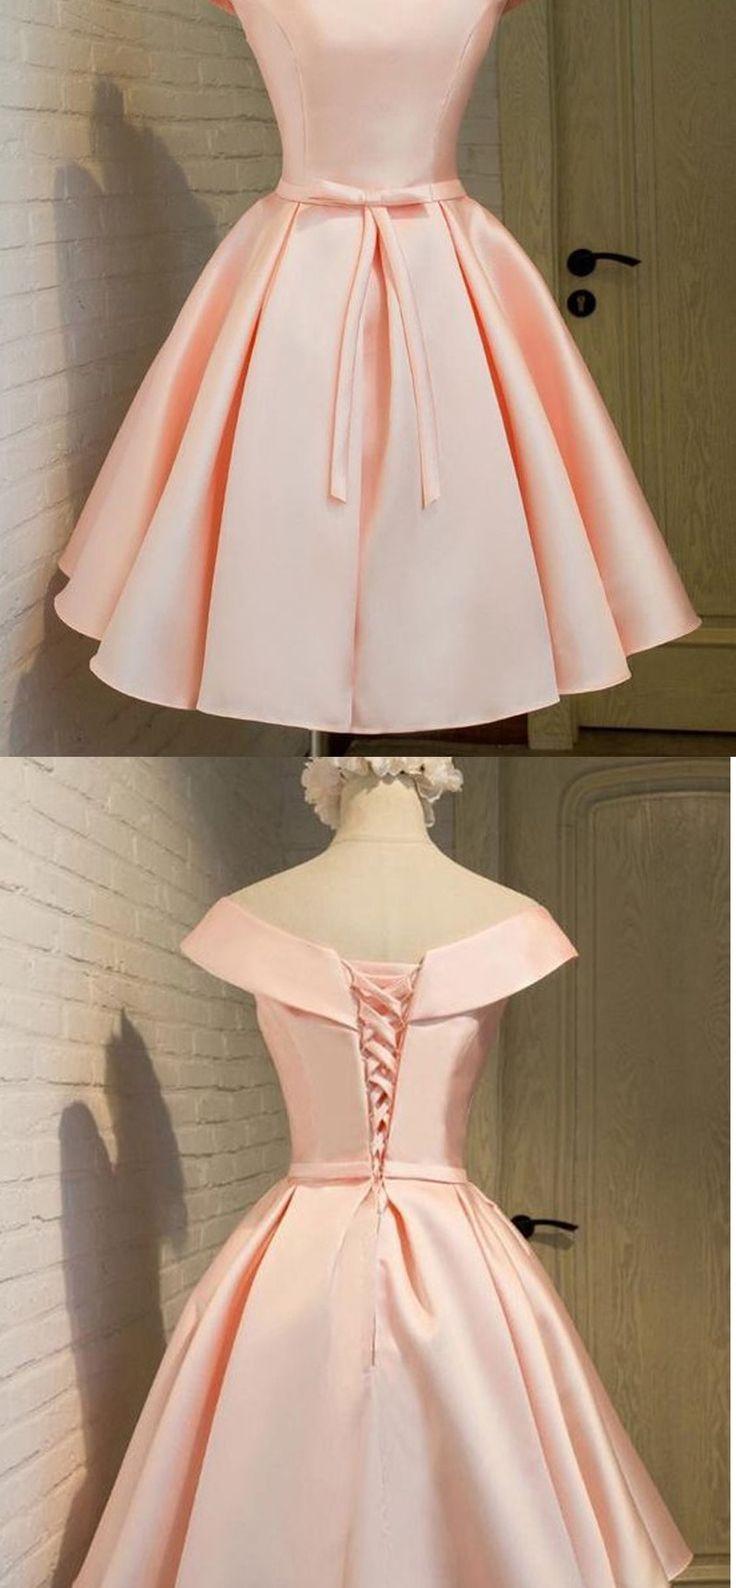 2017 Lace Up Cheap Pink Cocktail Dresses,1950s Vintage Hepburn Prom Dress,Blush Short Elegant Satin Homecoming Dresses,Sweet 16 Dresses,Homecoming Dress